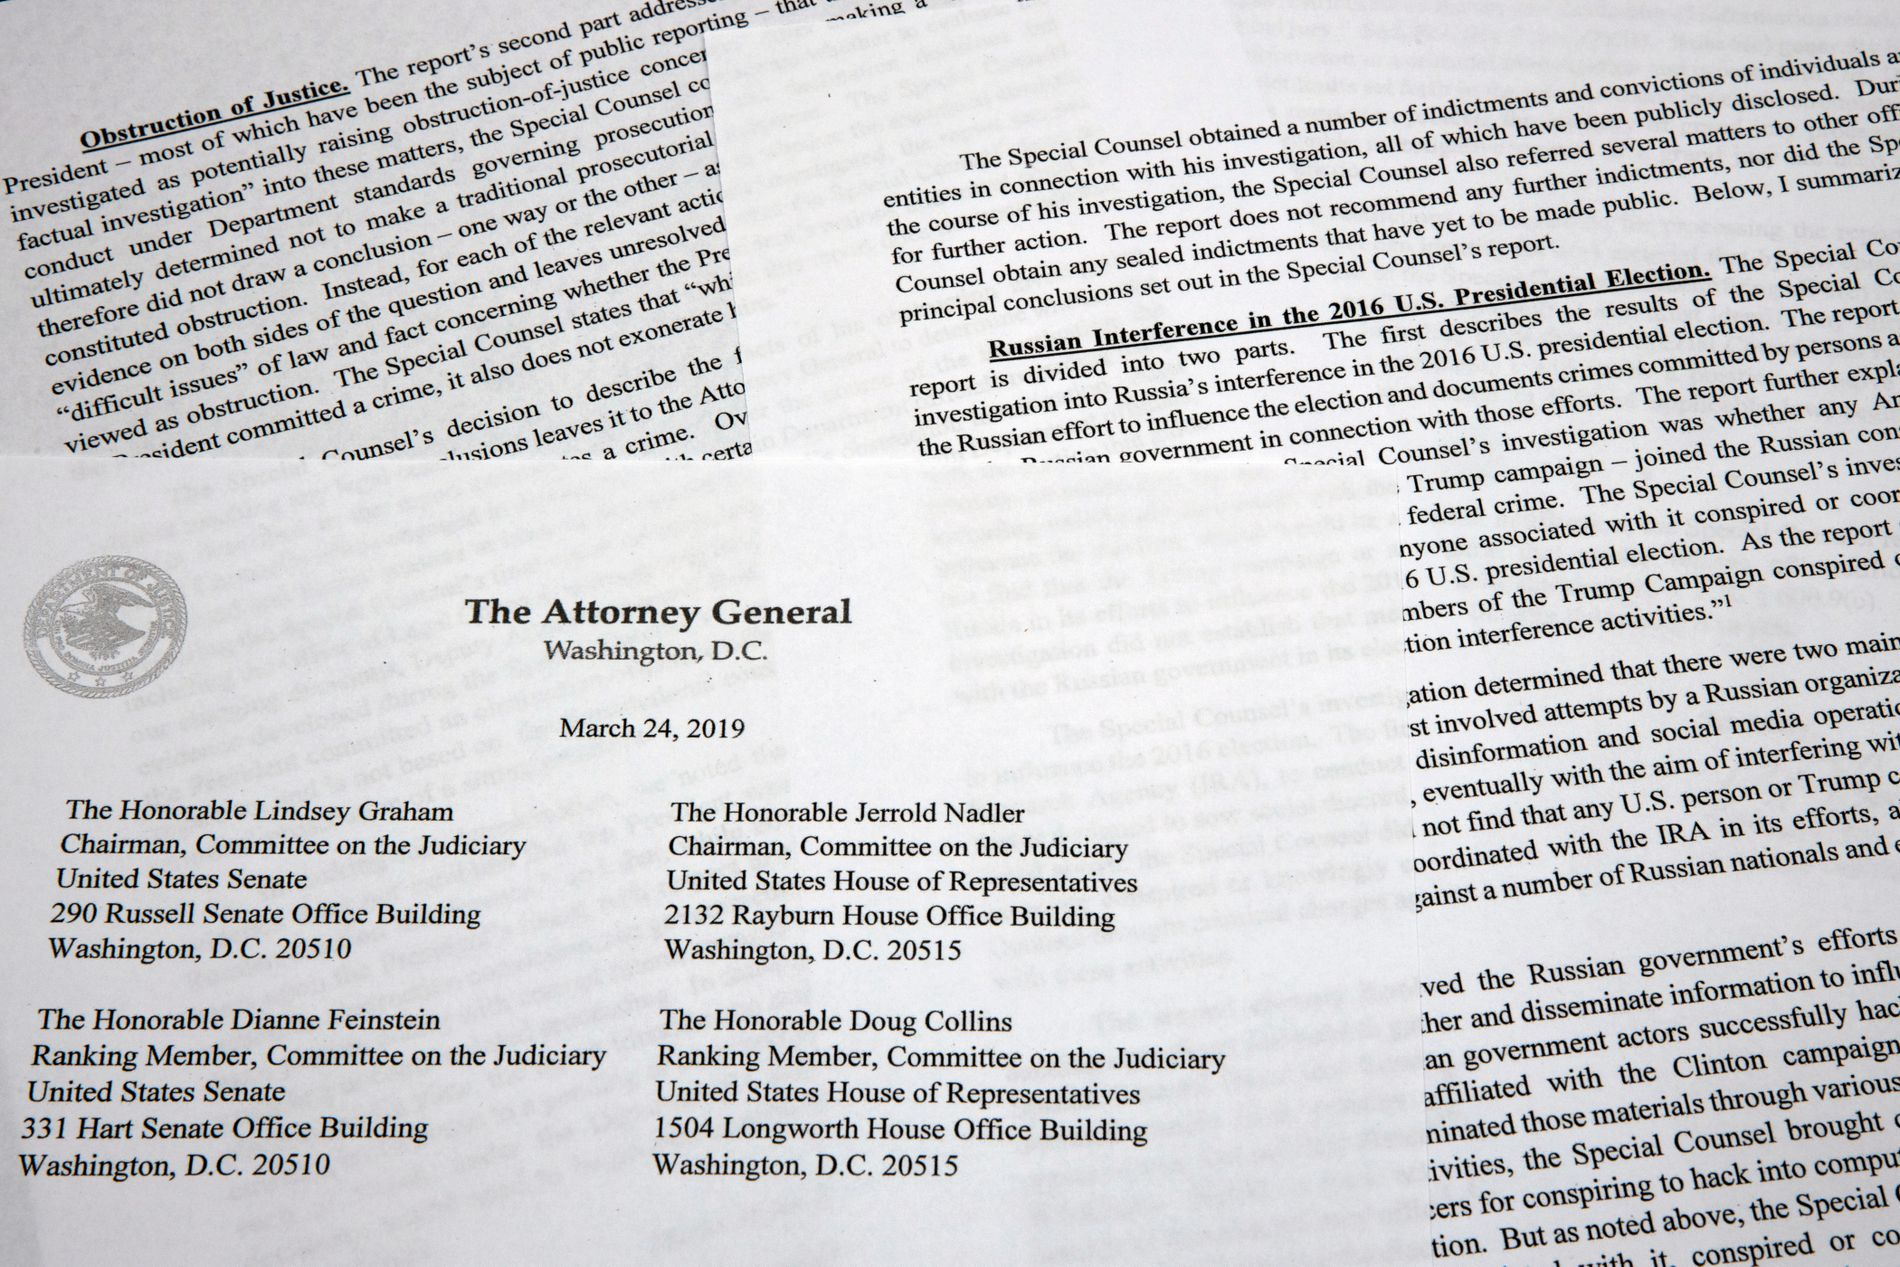 SAMMENDRAGET: USAs justisminister William Barr har sendt dette brevet til Kongressen, som sammenfatter Mueller-rapportens hovedfunn.